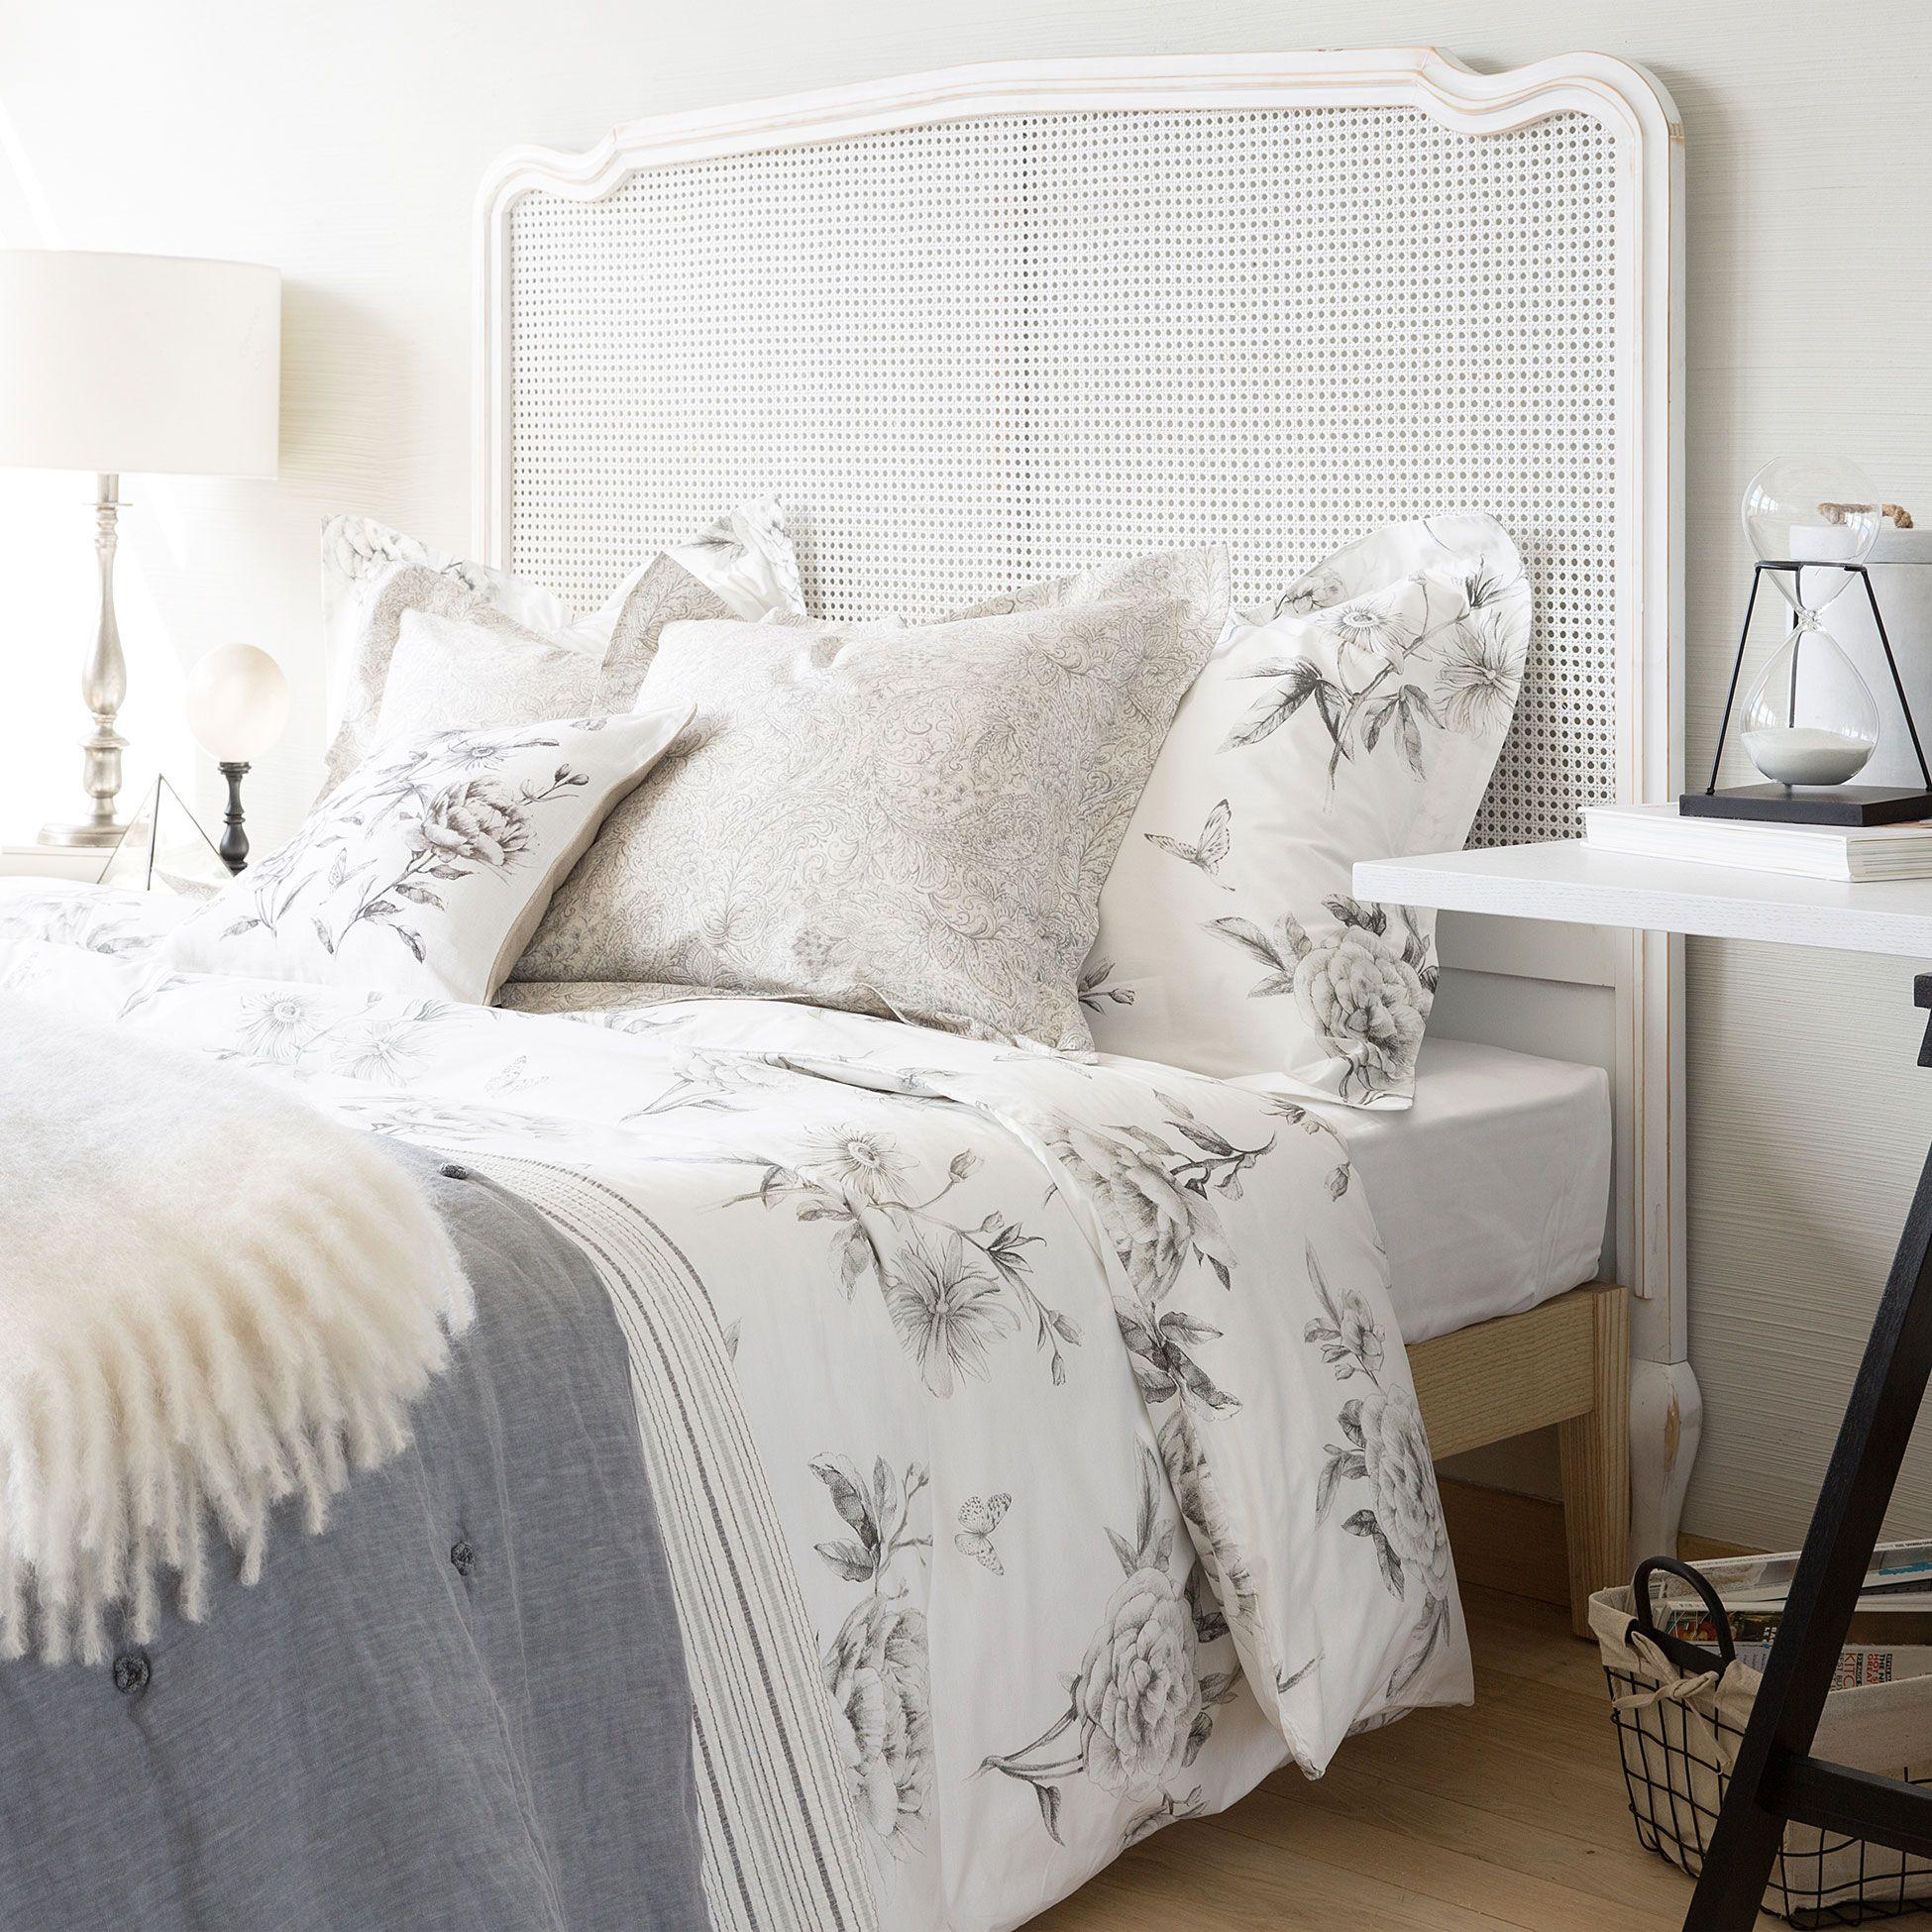 Zara home interior design - Floral Print Percale Bedlinen Bed Linen Bedroom New Collection Zara Home Belgium